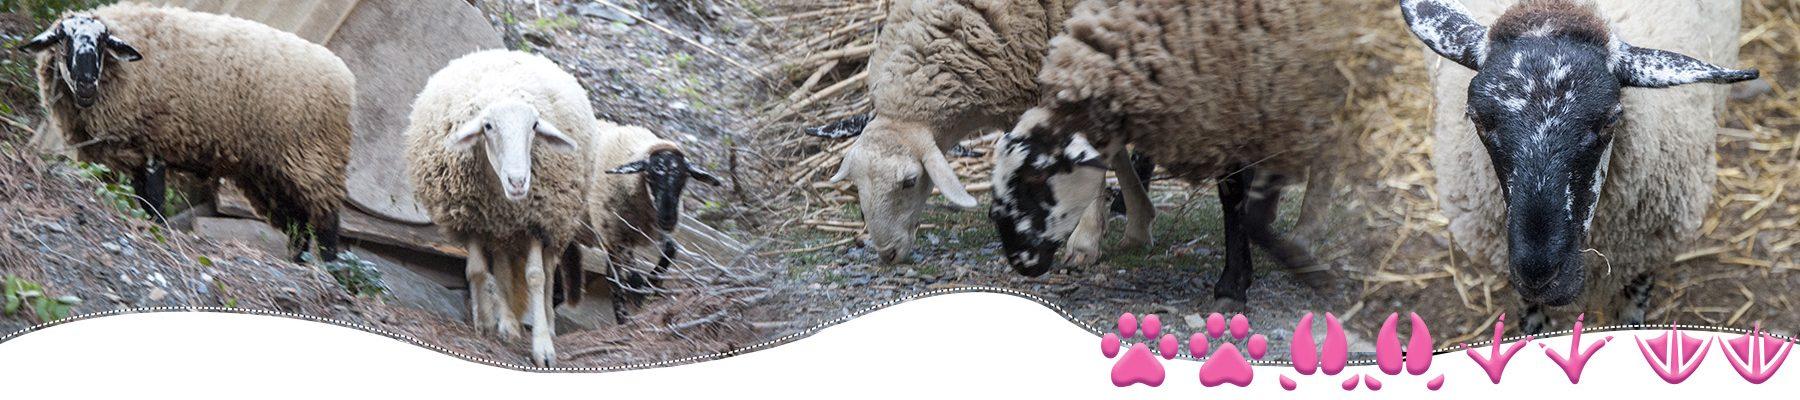 Familia ovejas del Santuario BuenaVida